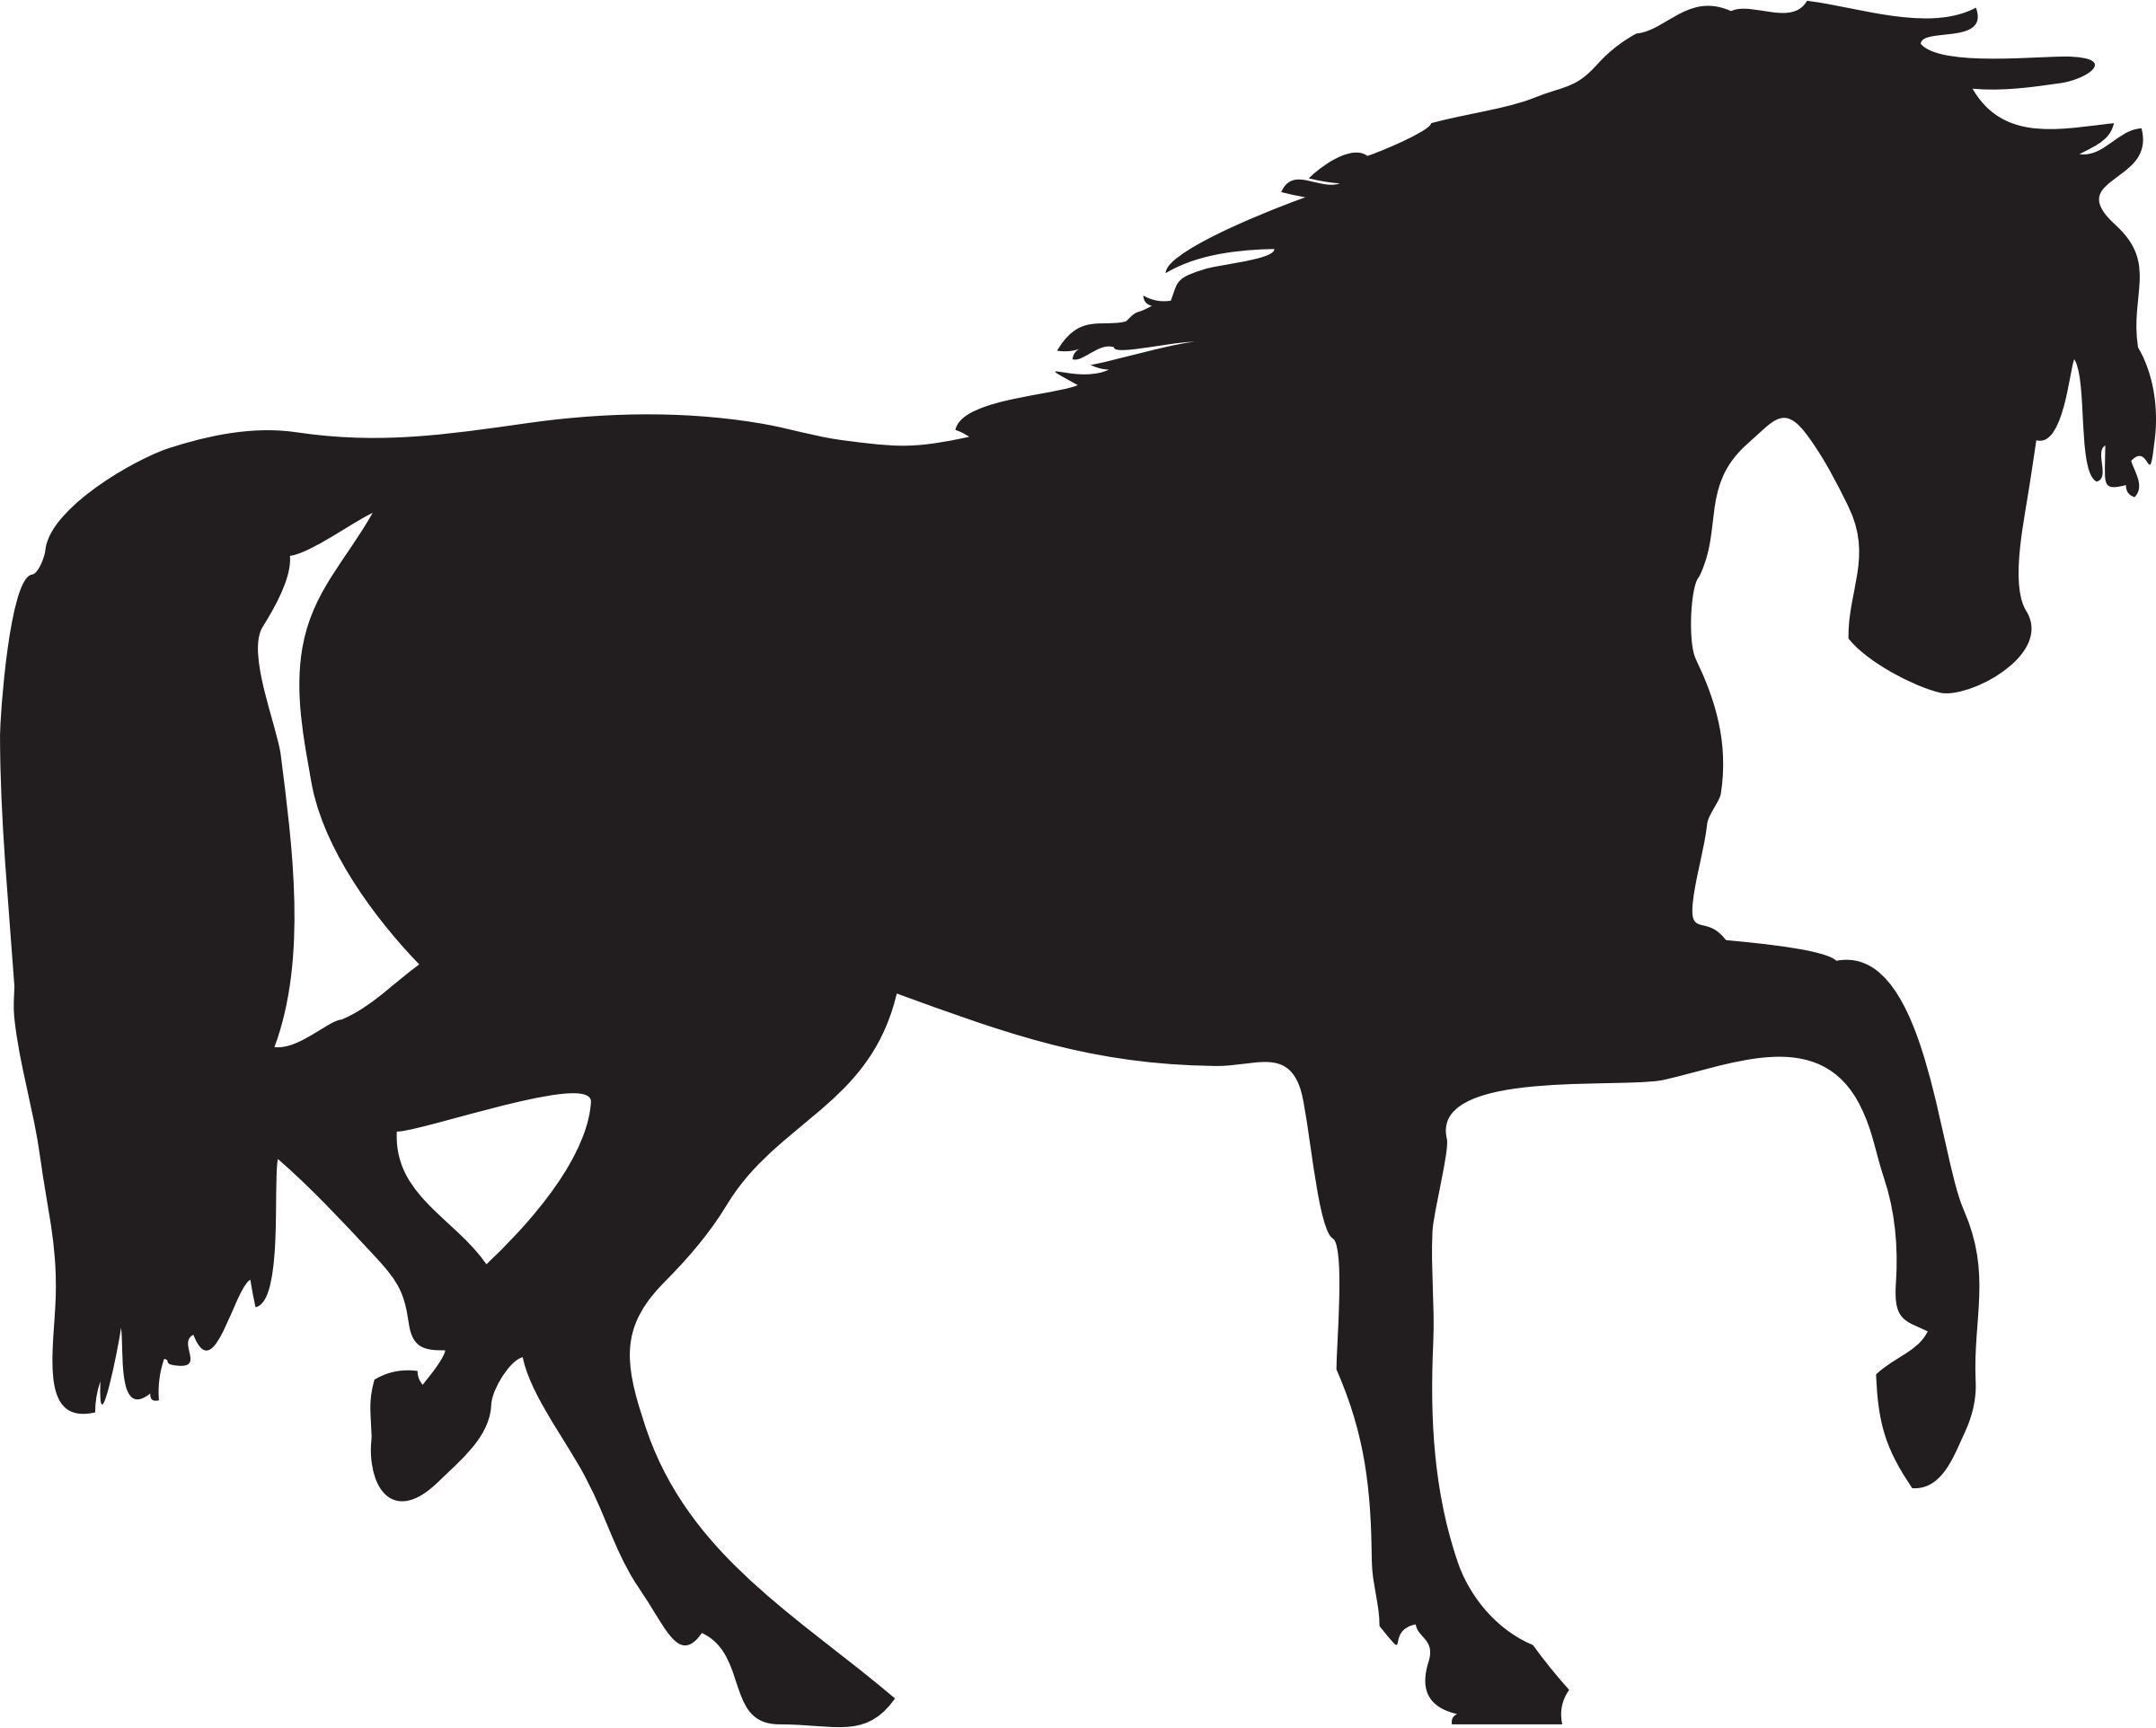 Horse silhouette big image. Horses clipart equine